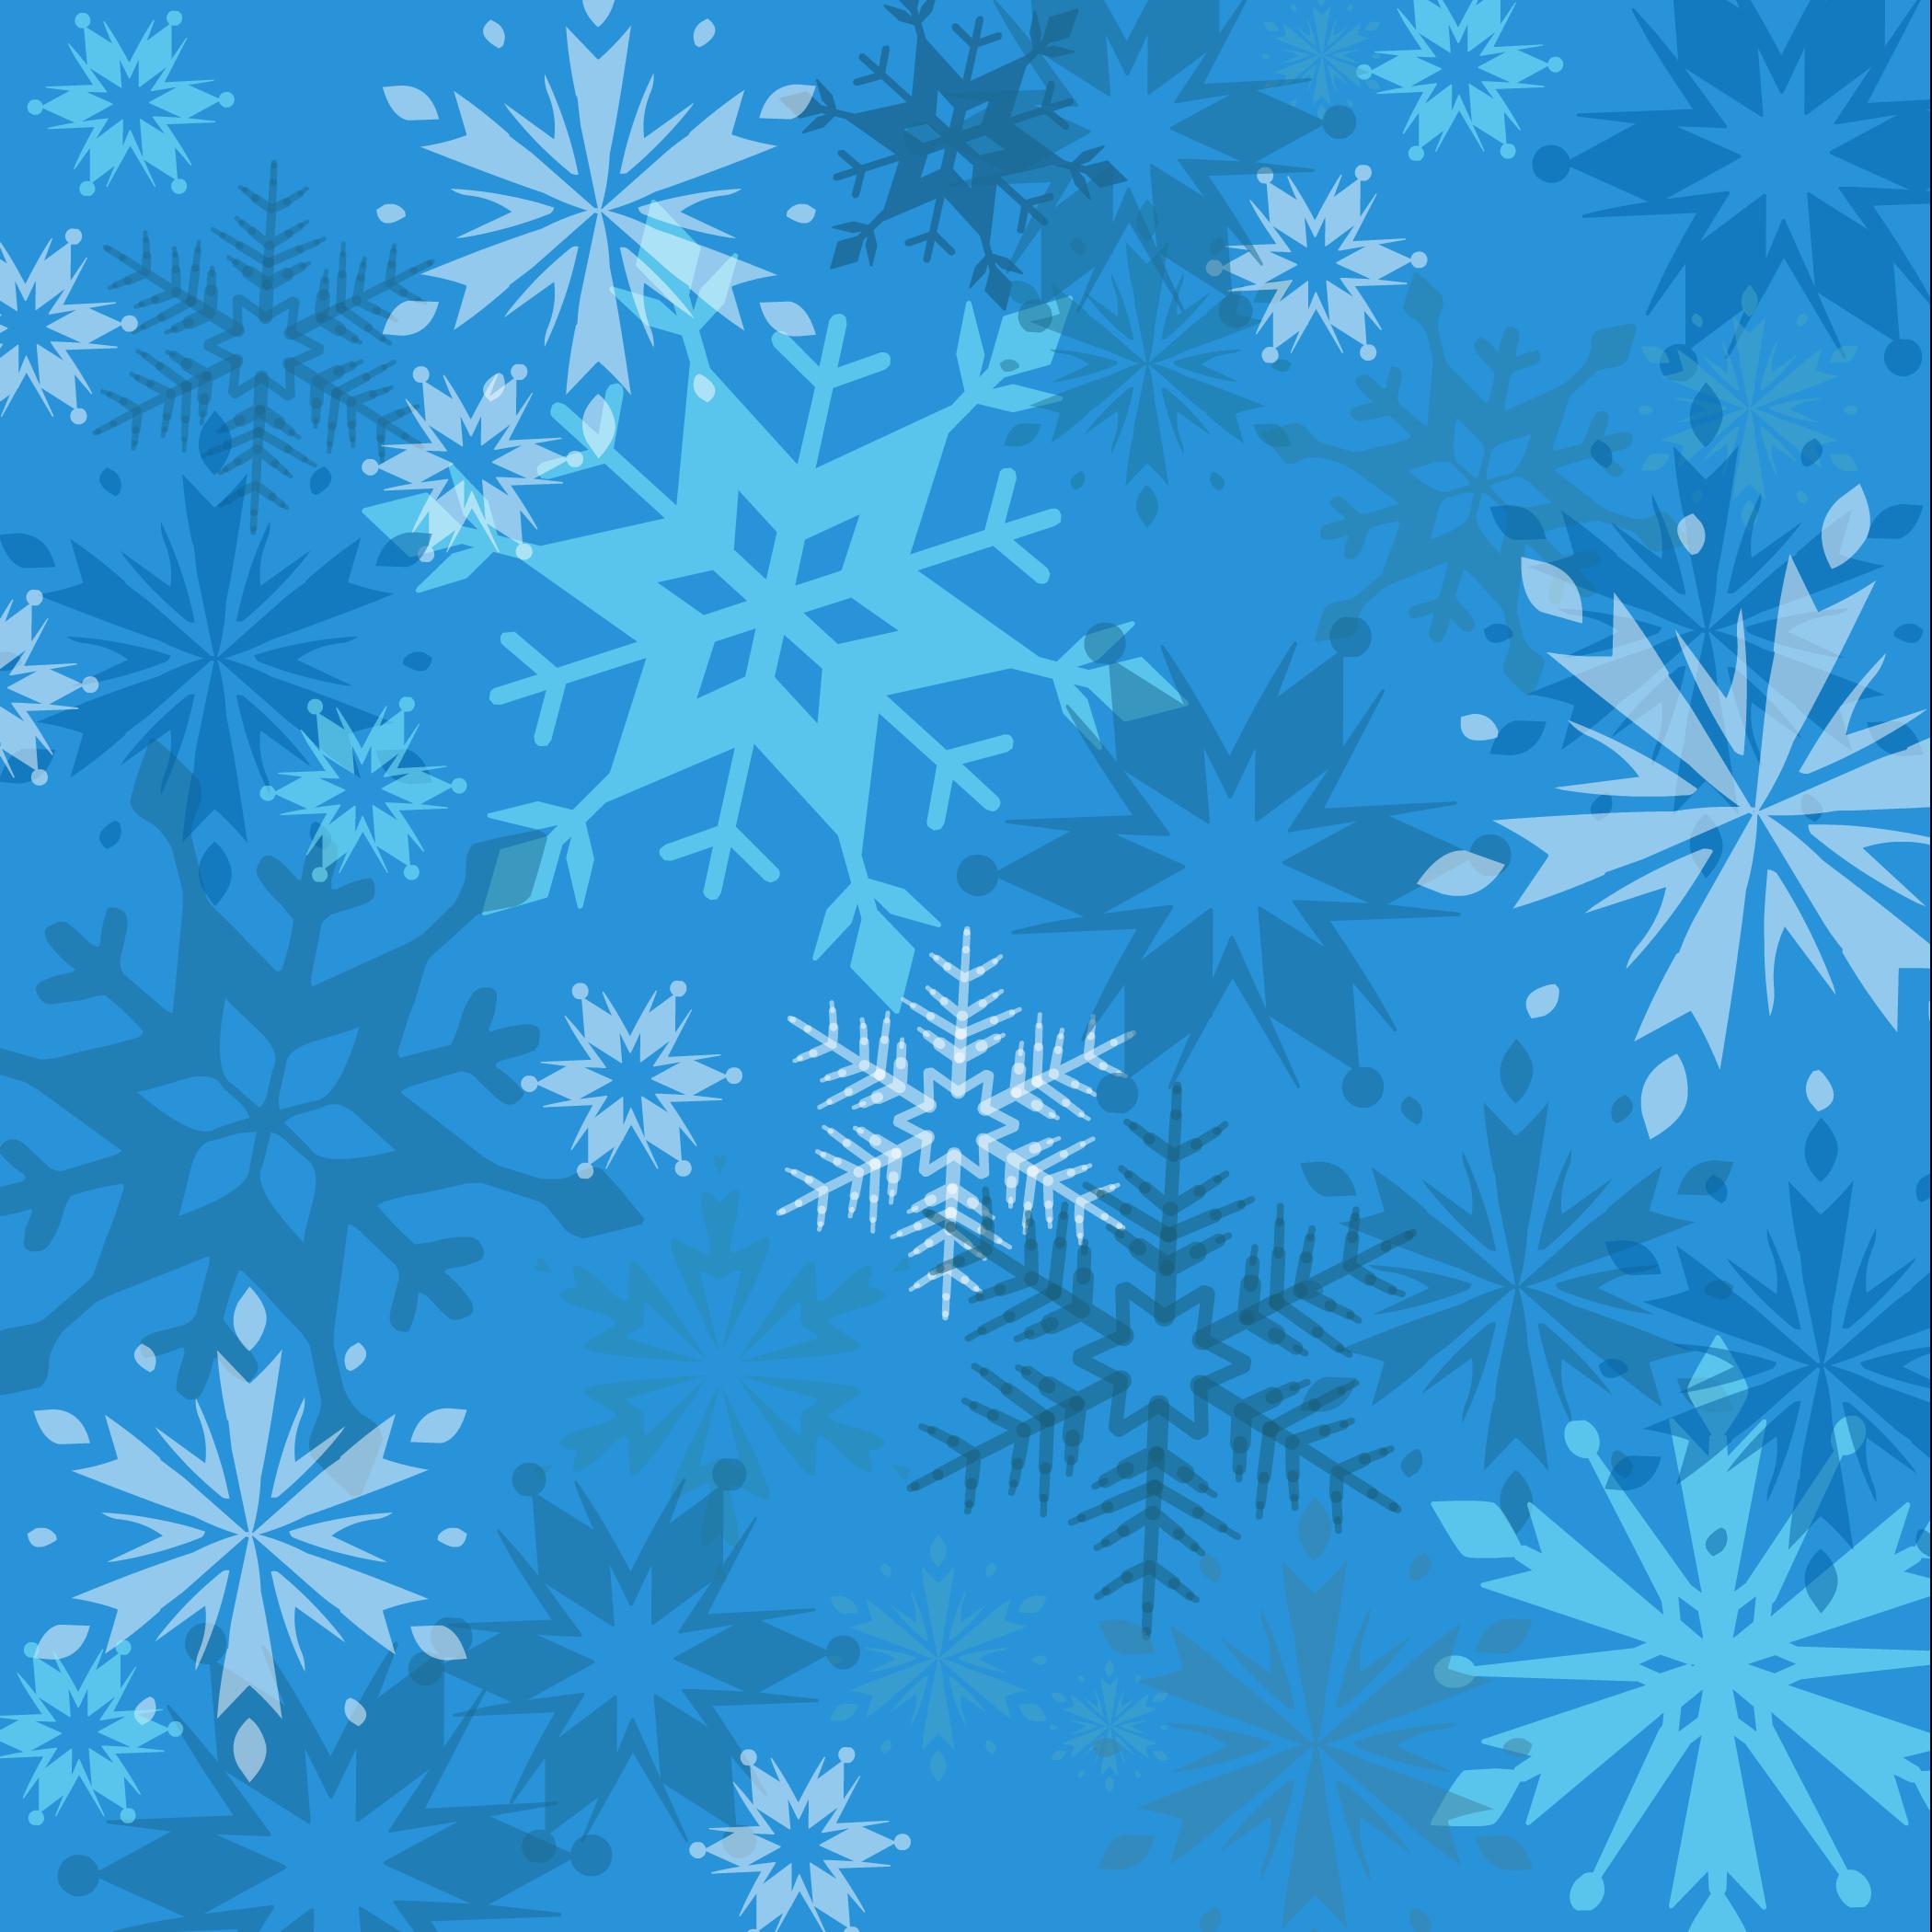 Fondo de Copos de Nieve (ID 9274)